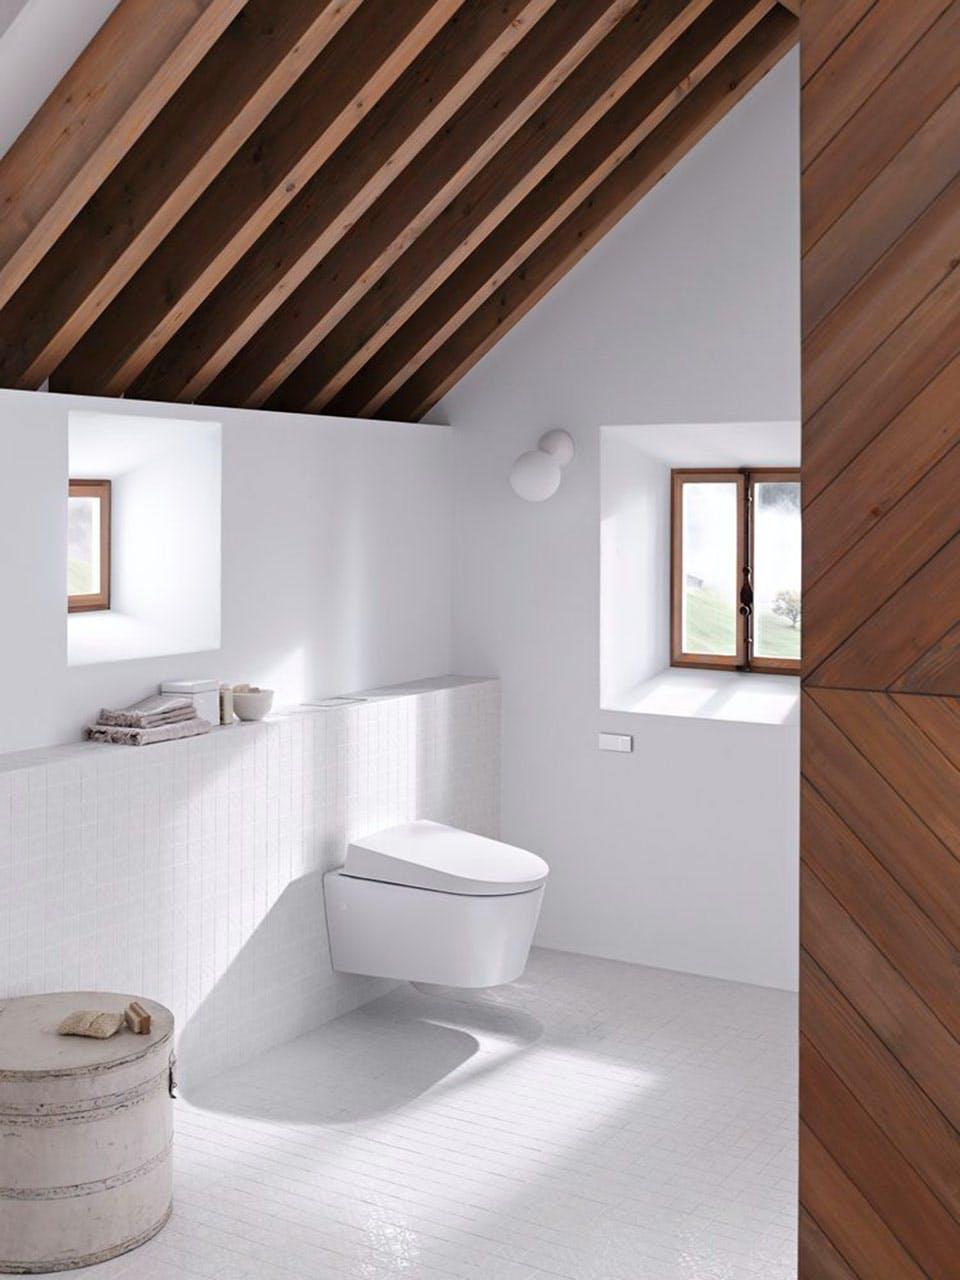 Geberit AquaClean Sela toilet med touchfree skyl betjeningsplade i flot design